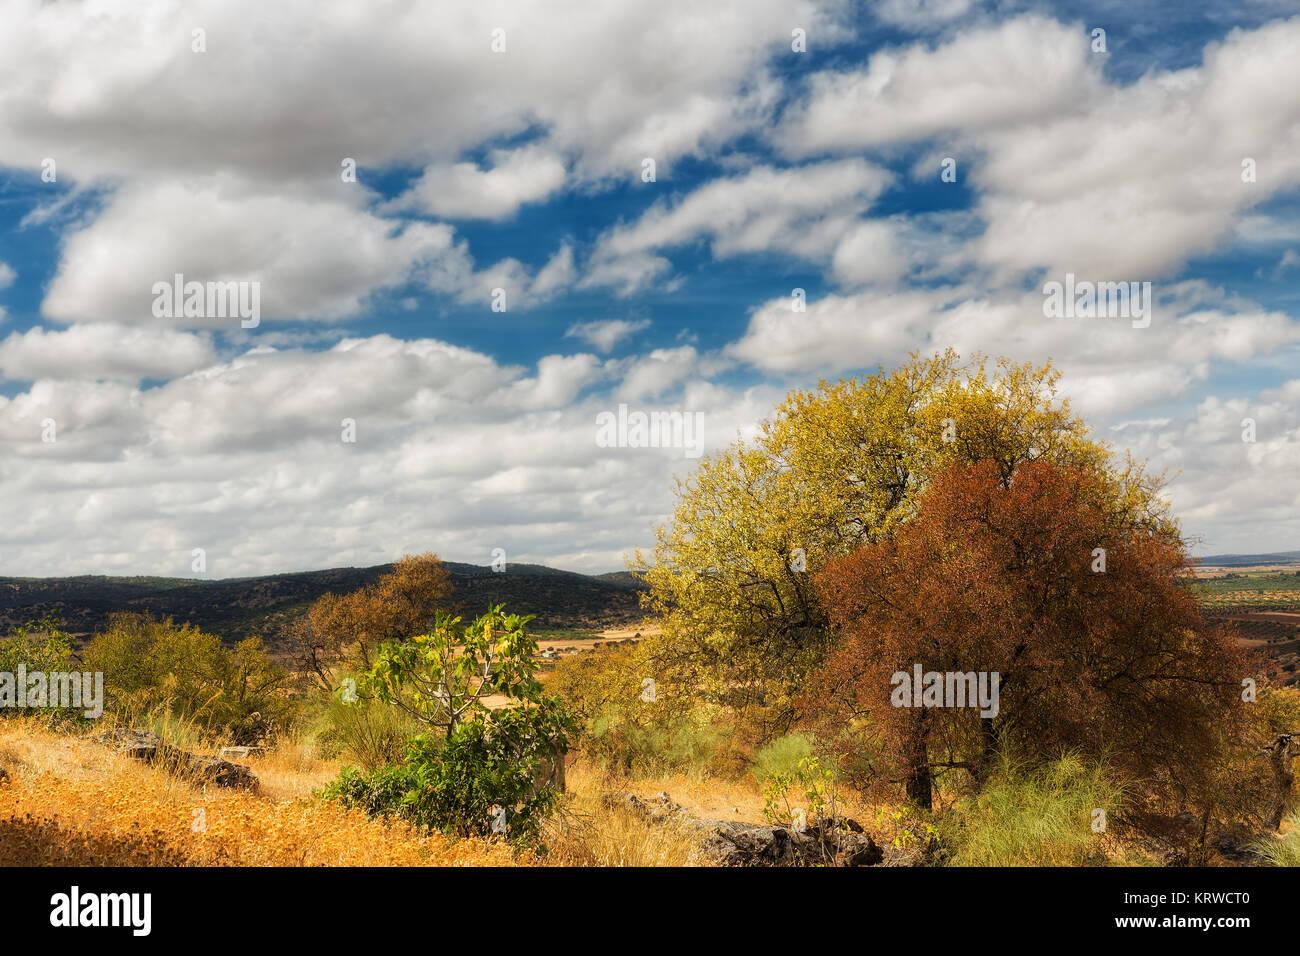 Paisaje con glamour, cerca de Nogales. España. Imagen De Stock